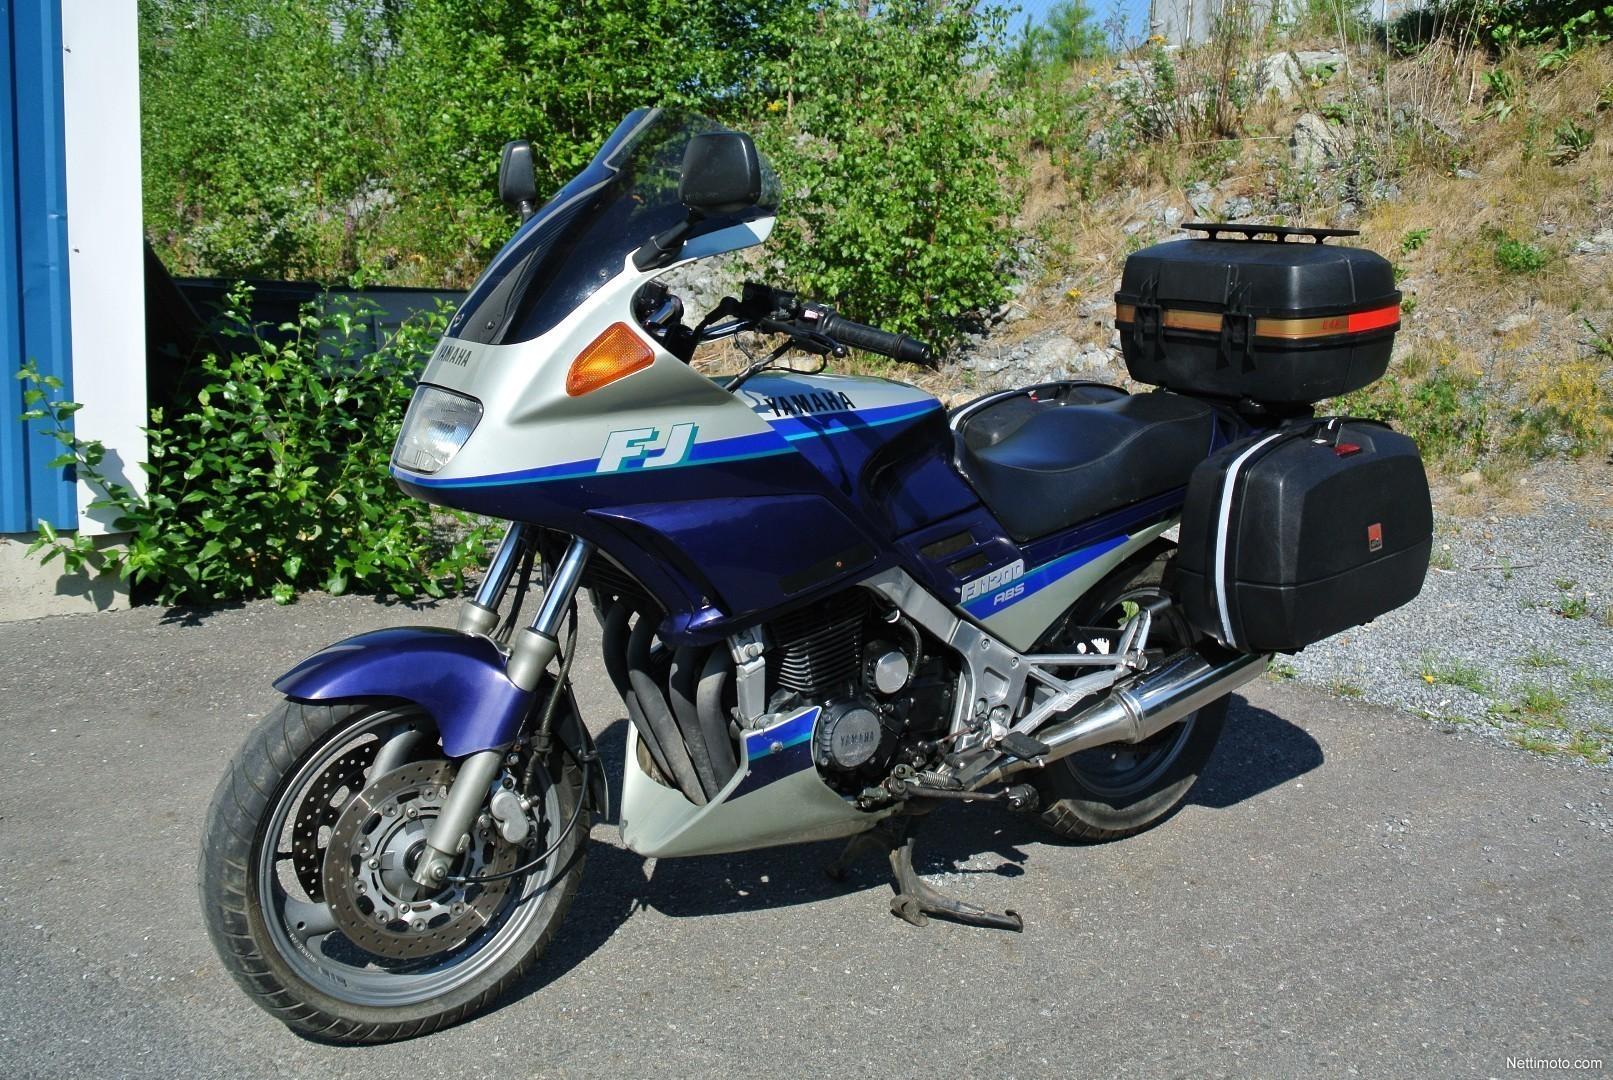 1989 Yamaha FJ 1200 - Moto.ZombDrive.COM